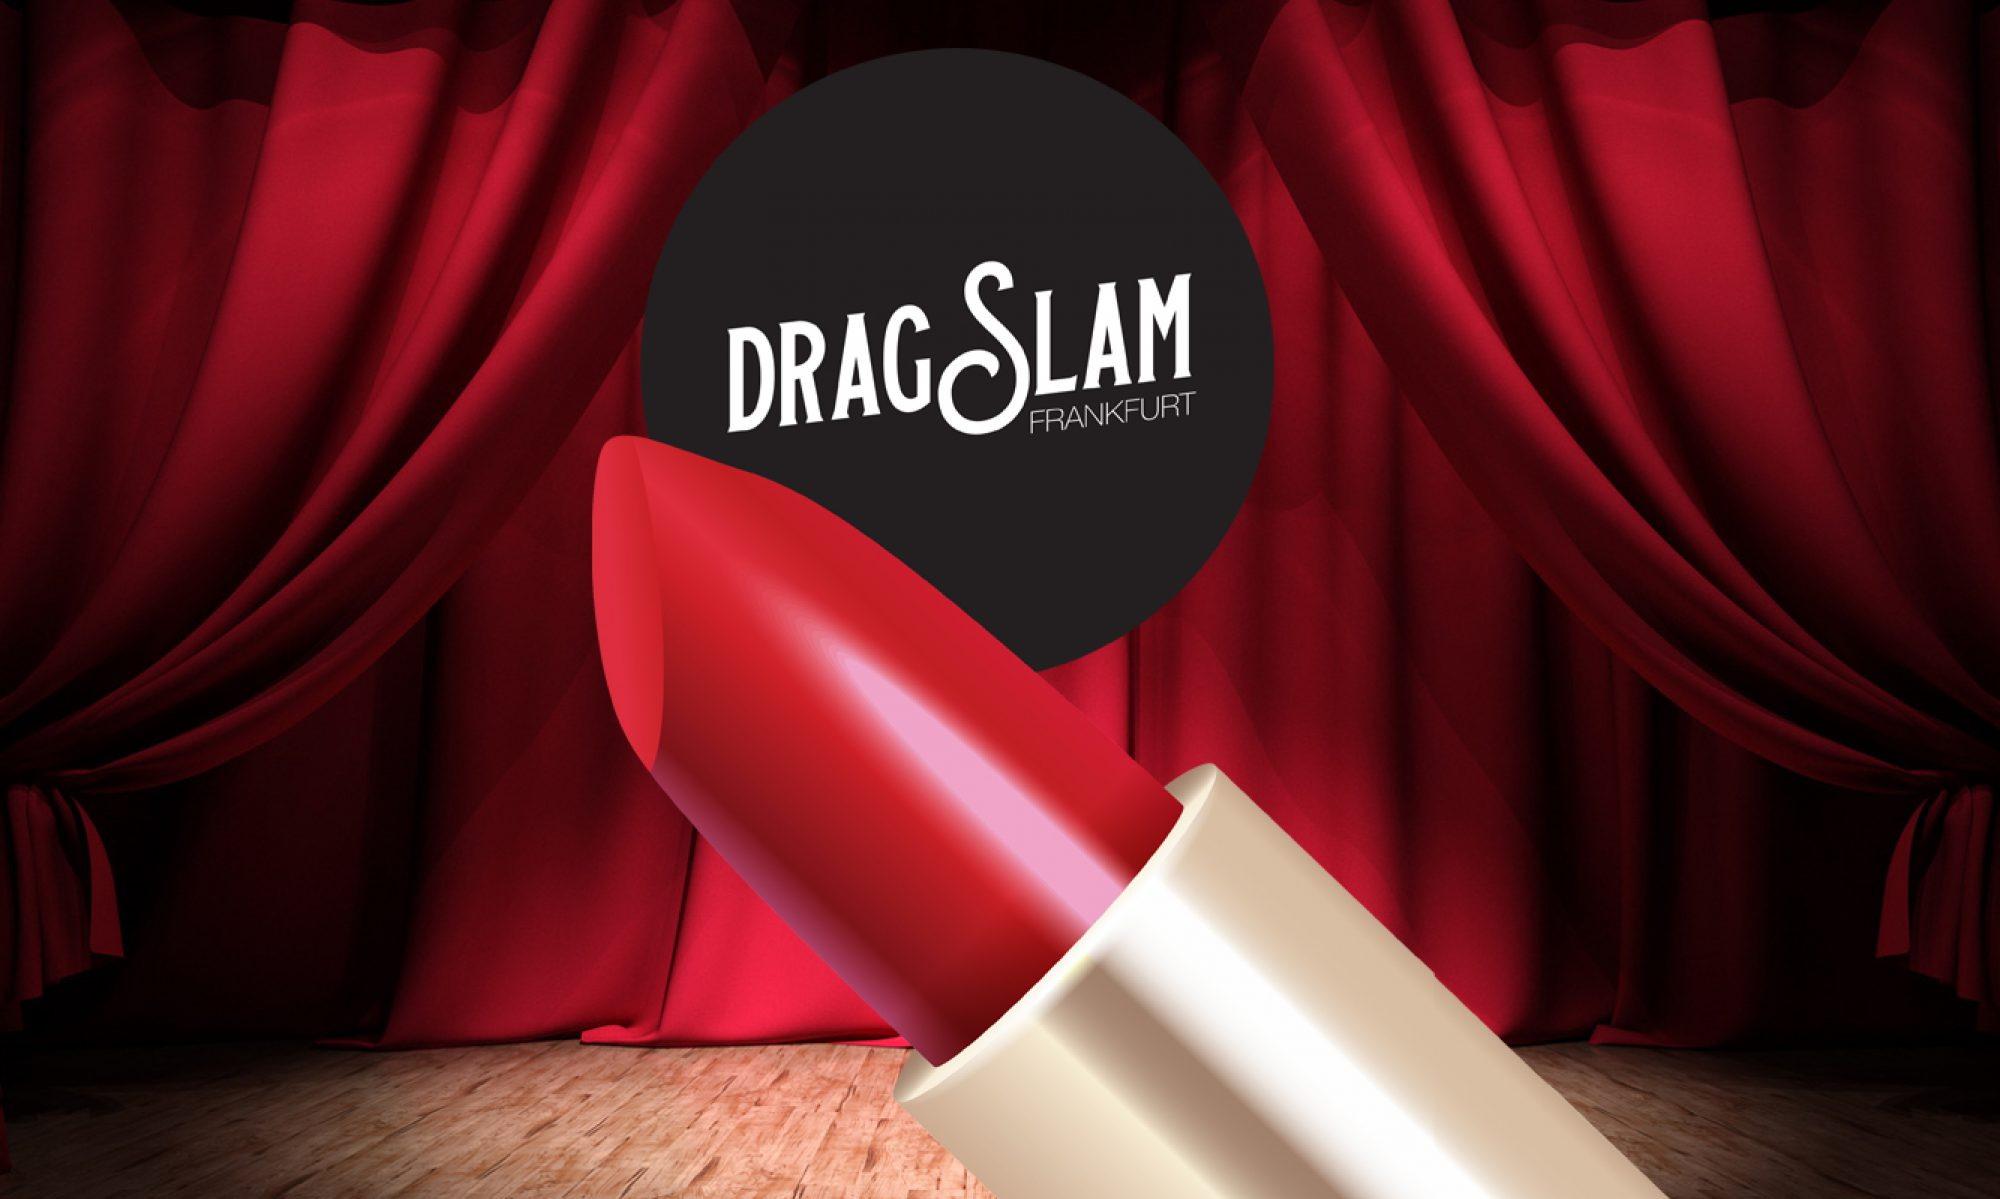 Drag Slam Frankfurt